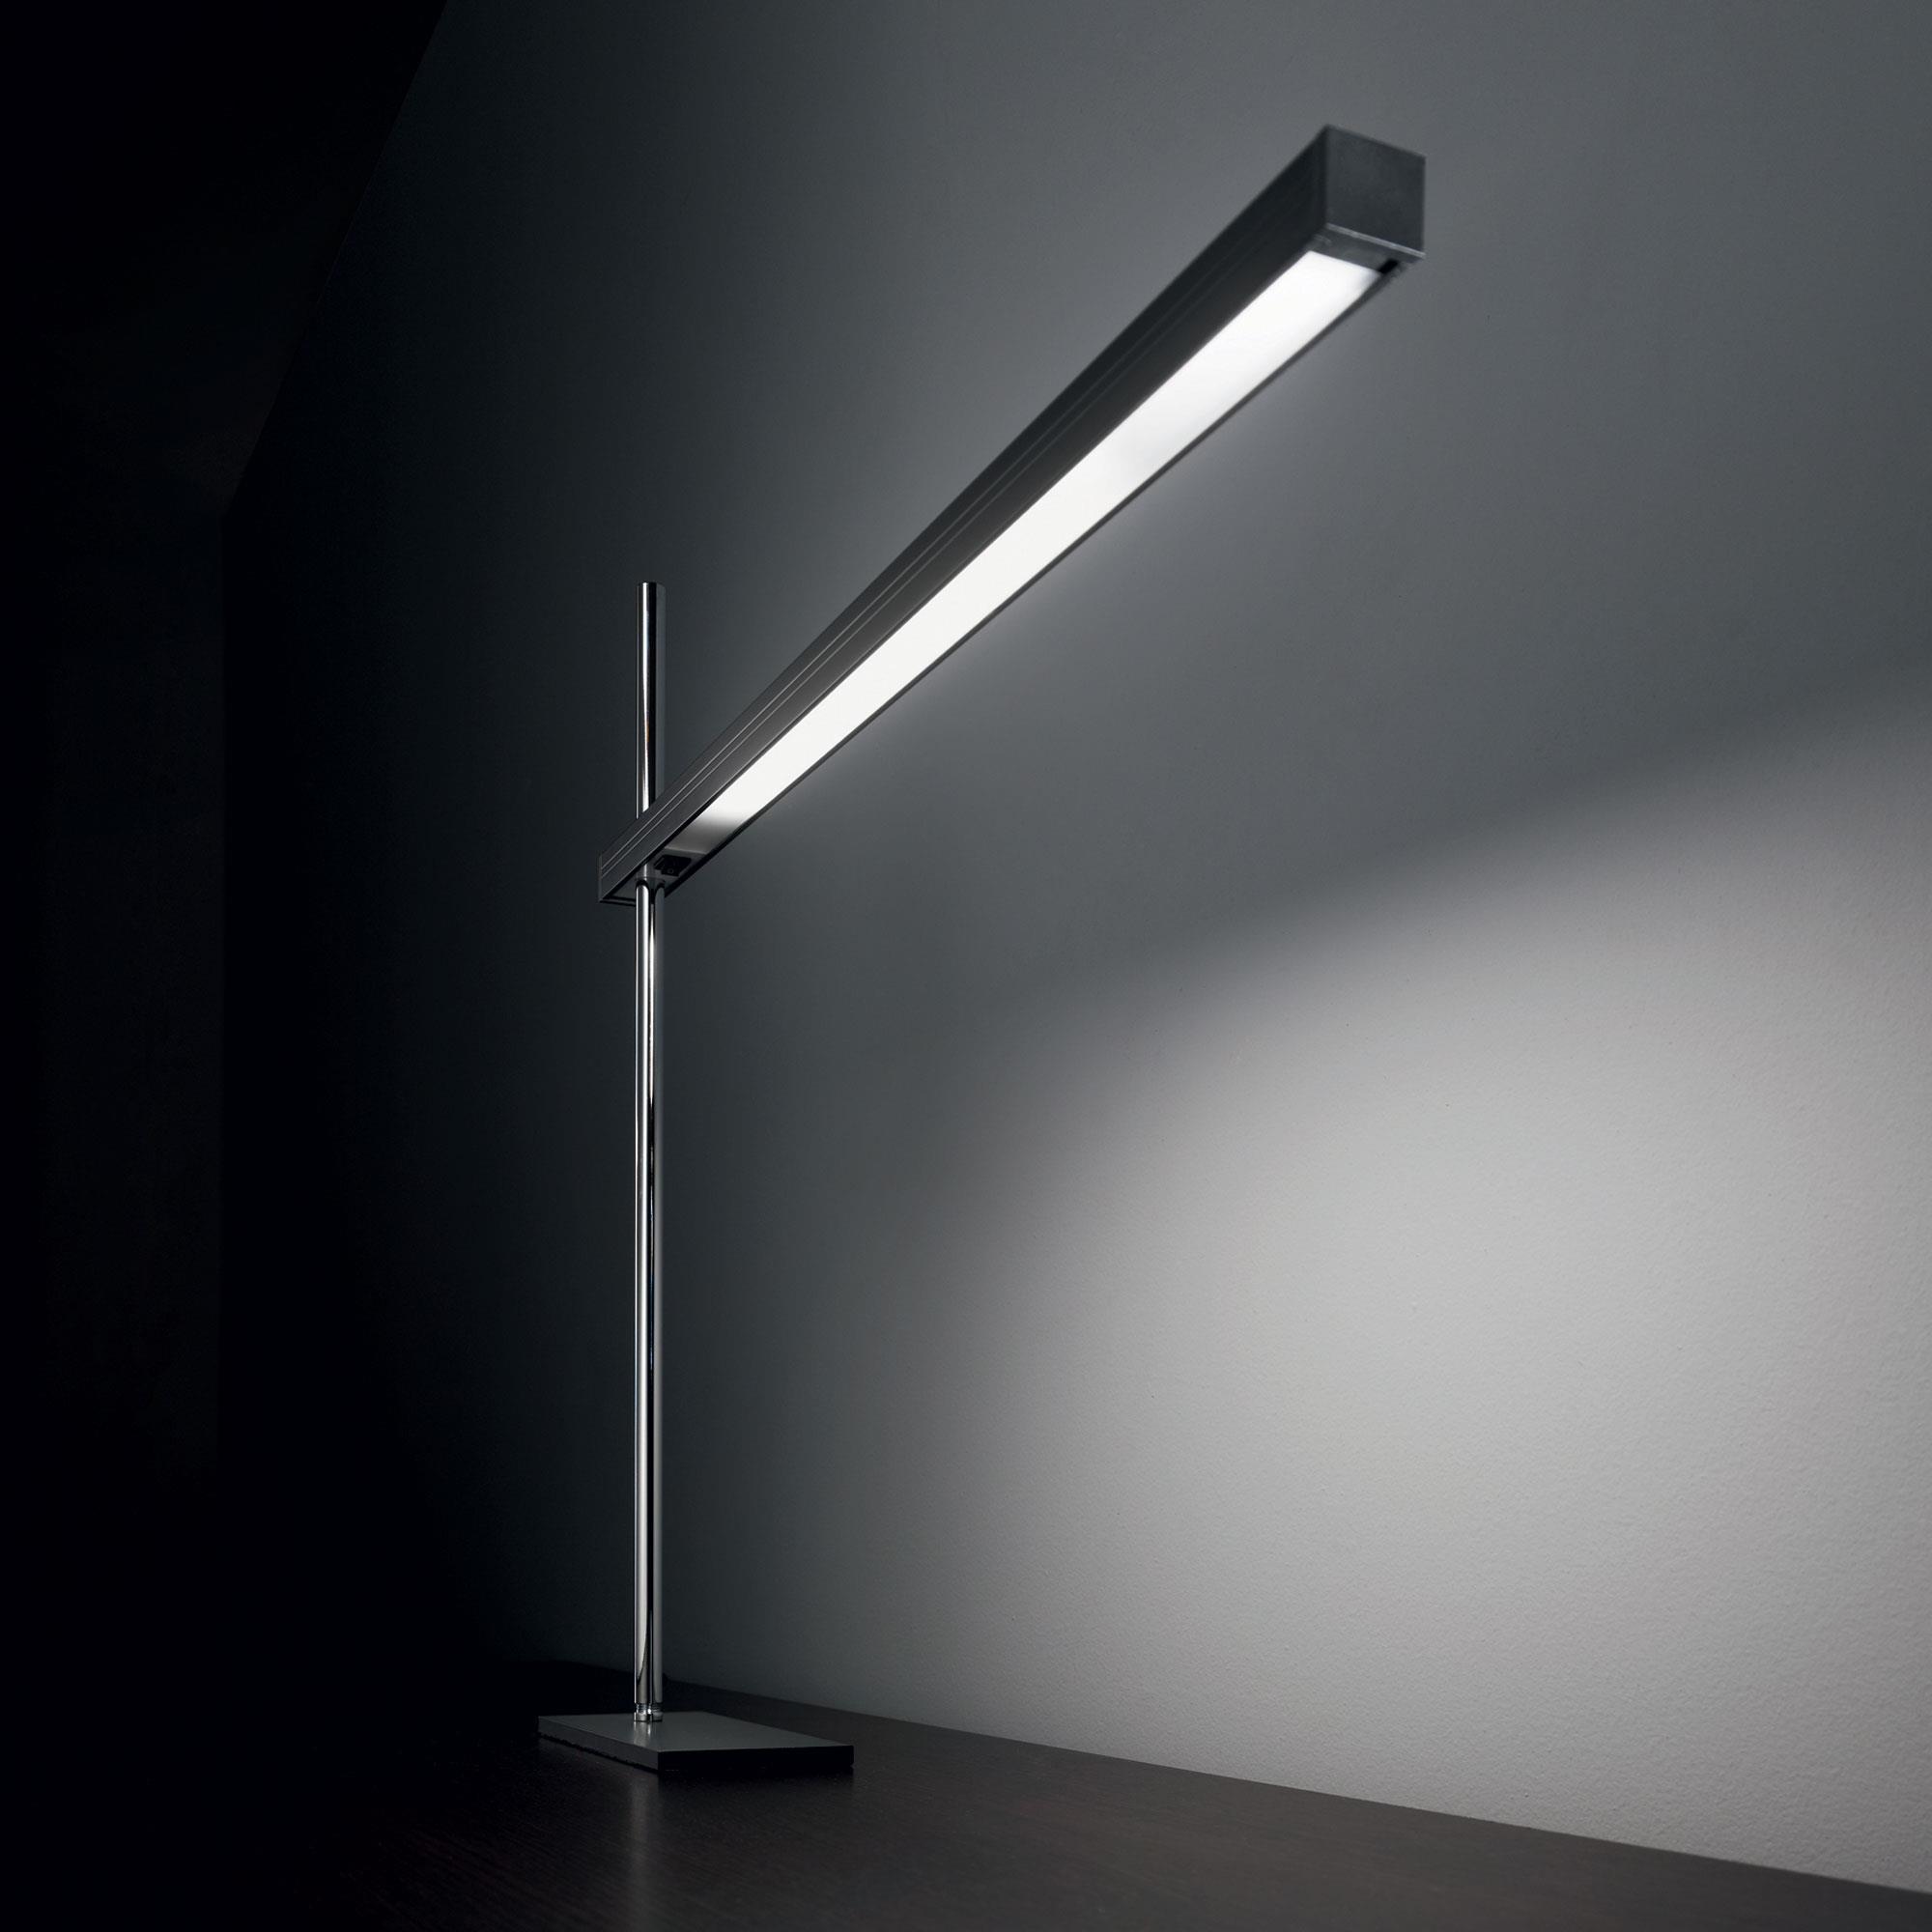 Ideal Lux 147659 GRU TL105 NERO asztali lámpa